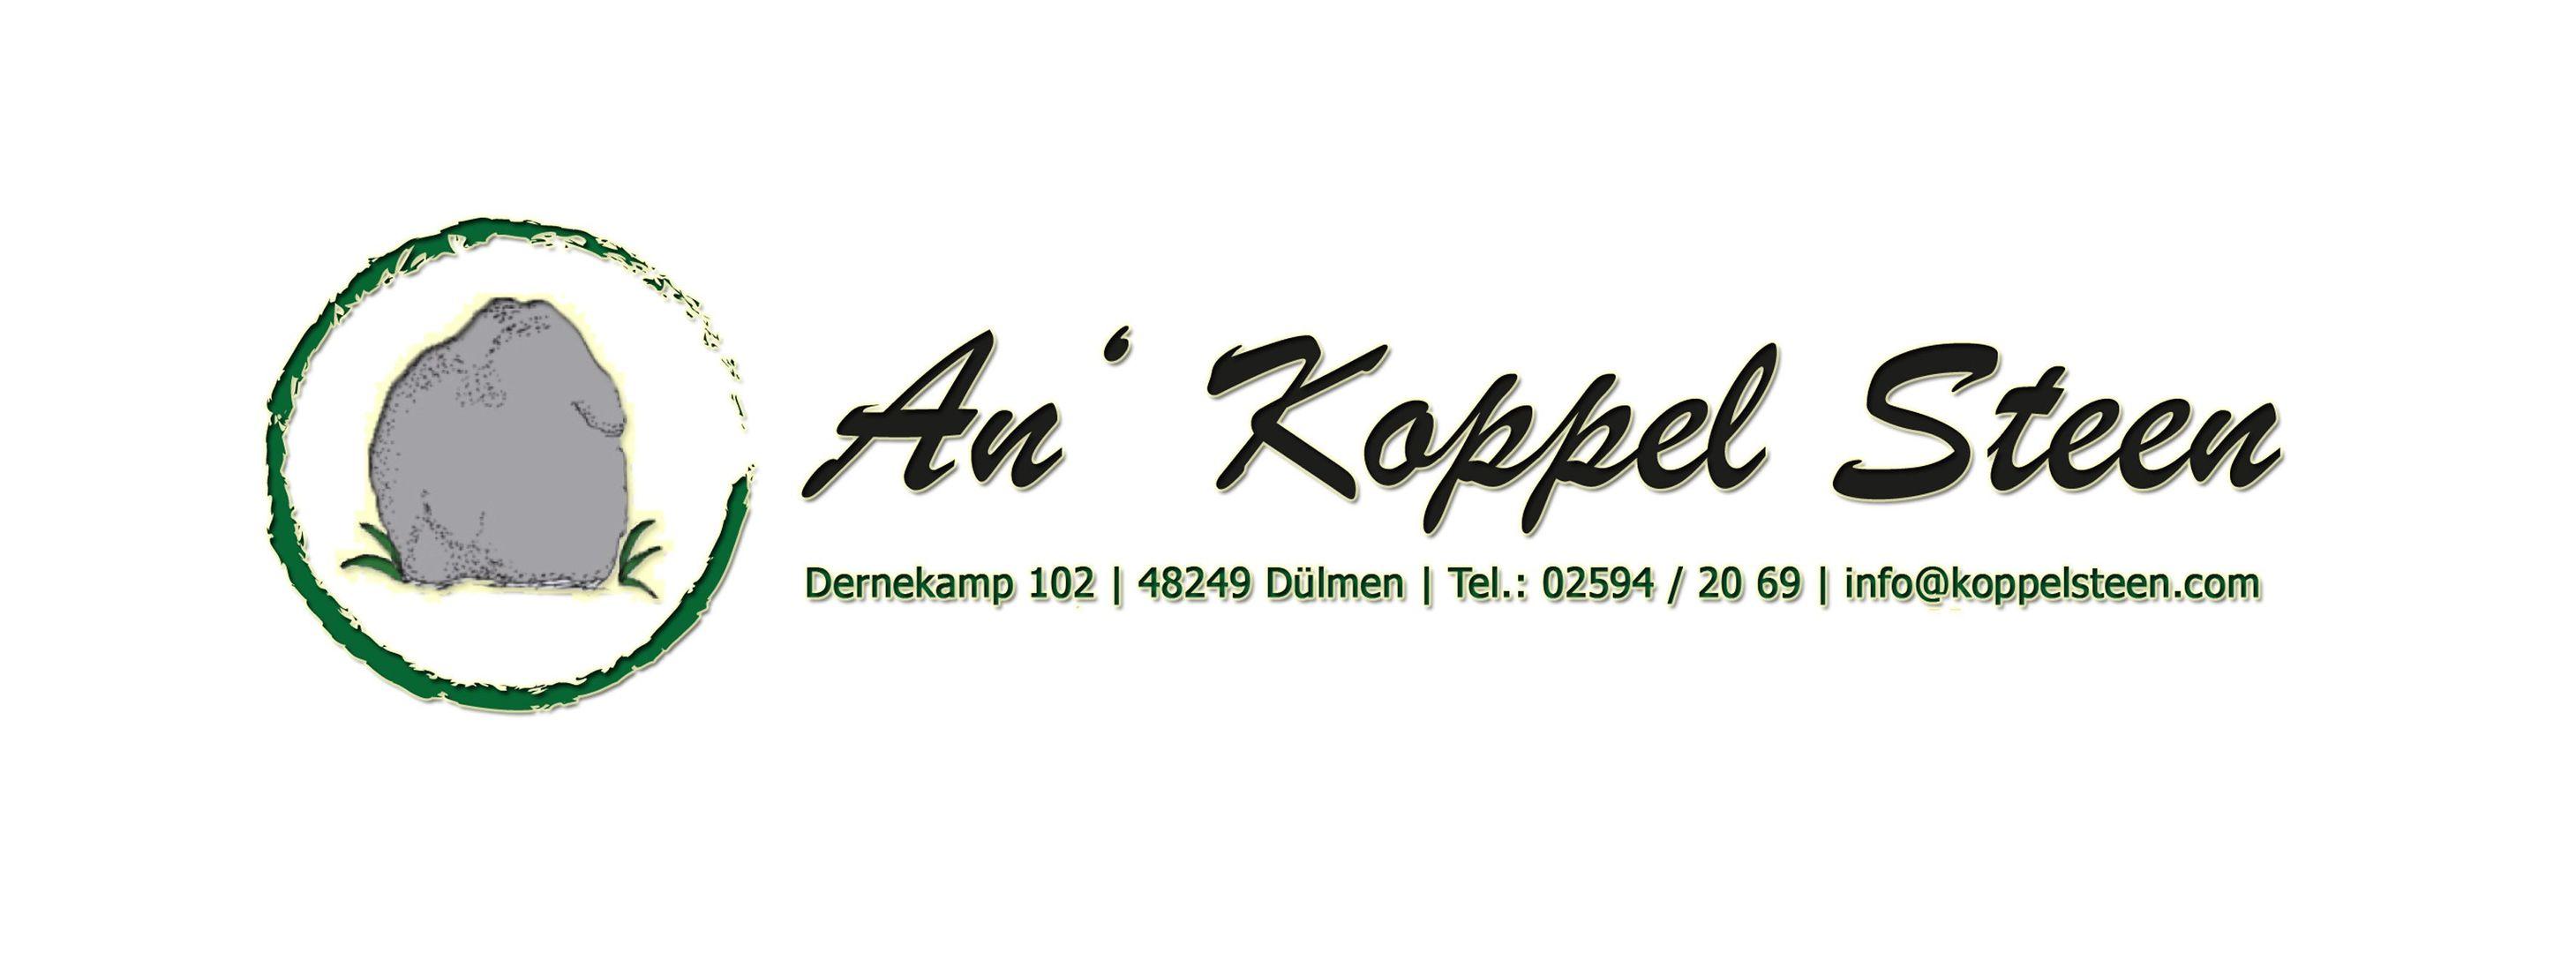 Öffnungszeiten | An´ Koppel Steen